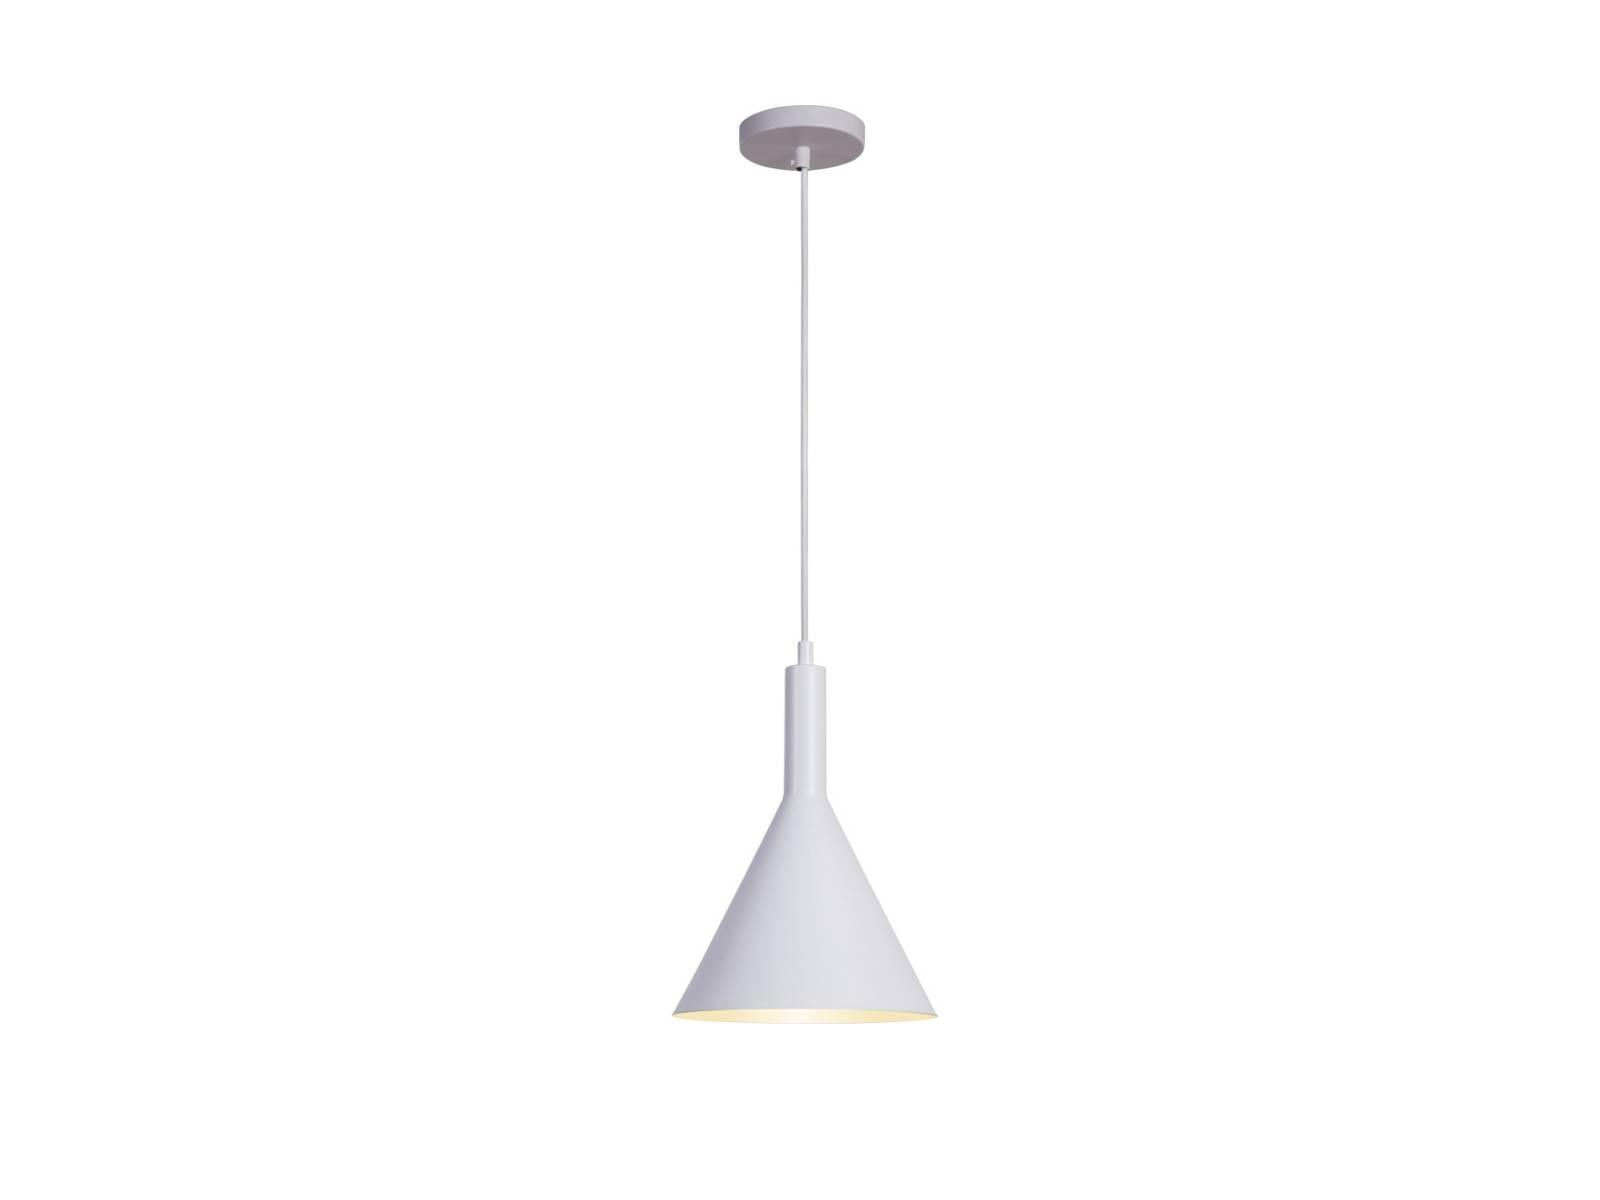 Lighting: Lbc Lighting | Commercial Ceiling Light Fixtures inside Commercial Pendant Lights (Image 14 of 15)